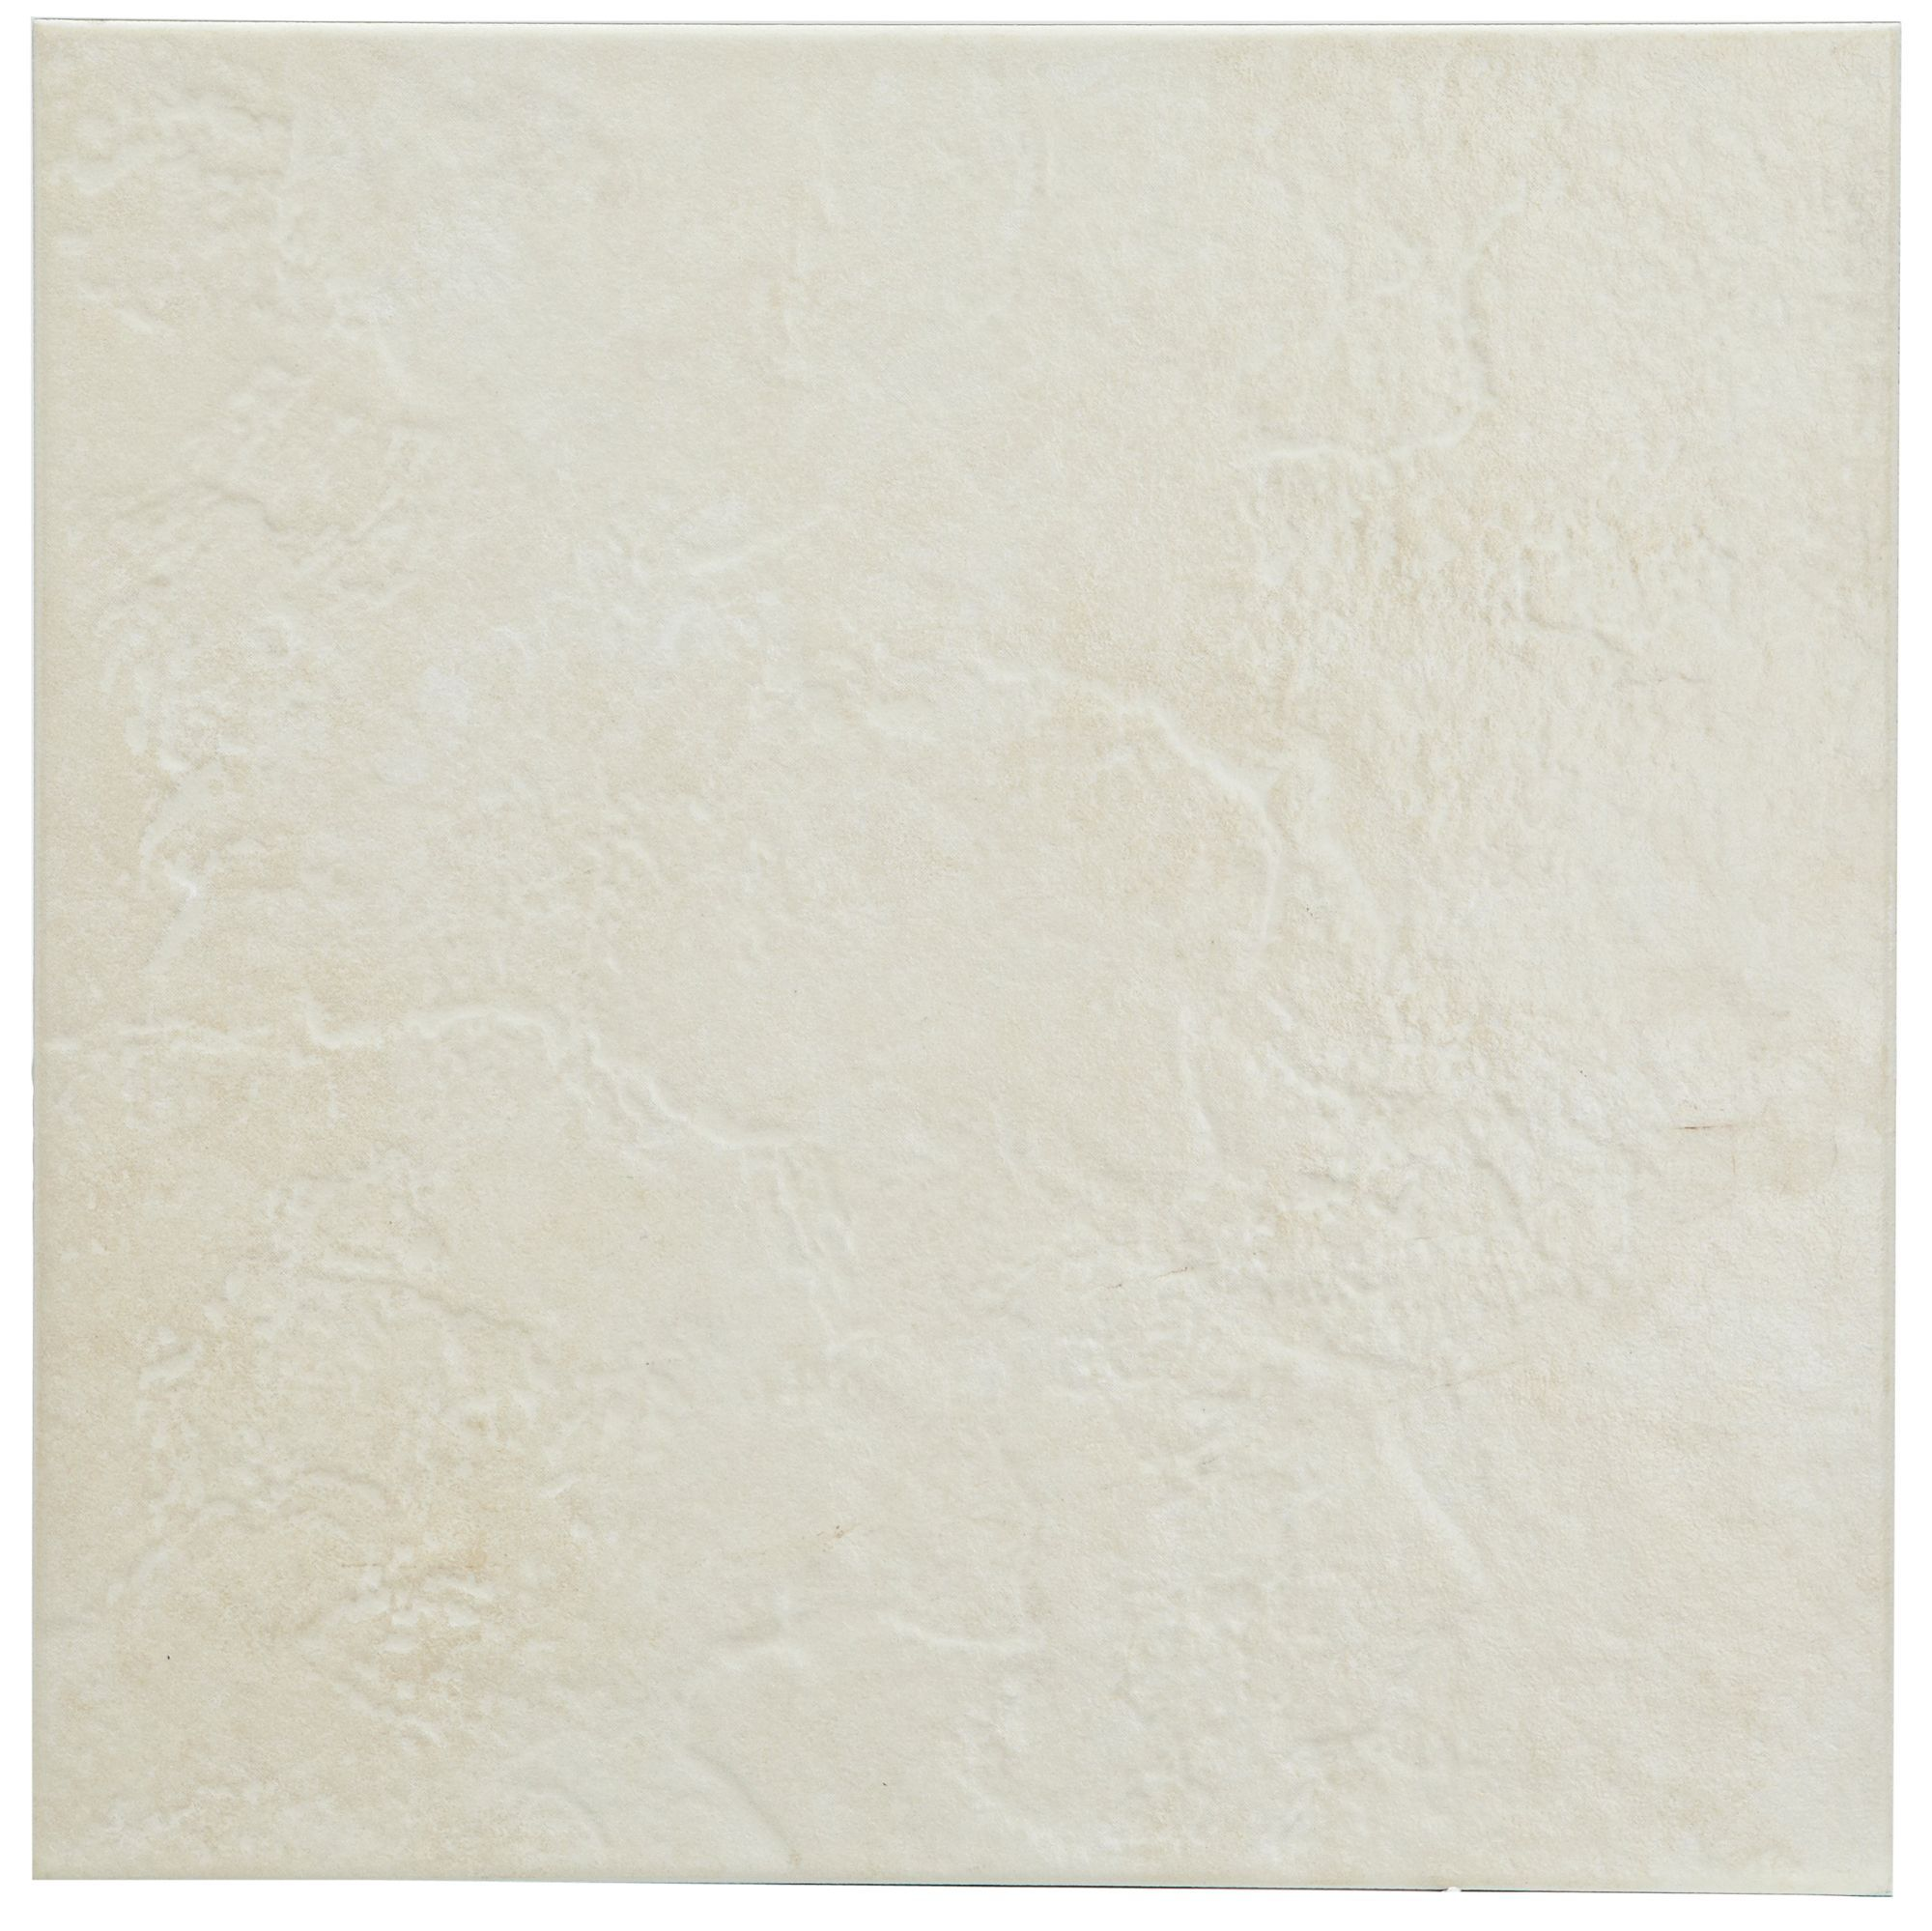 Cirque Beige Stone Effect Ceramic Floor Tile, Pack of 9, (L)333mm (W ...